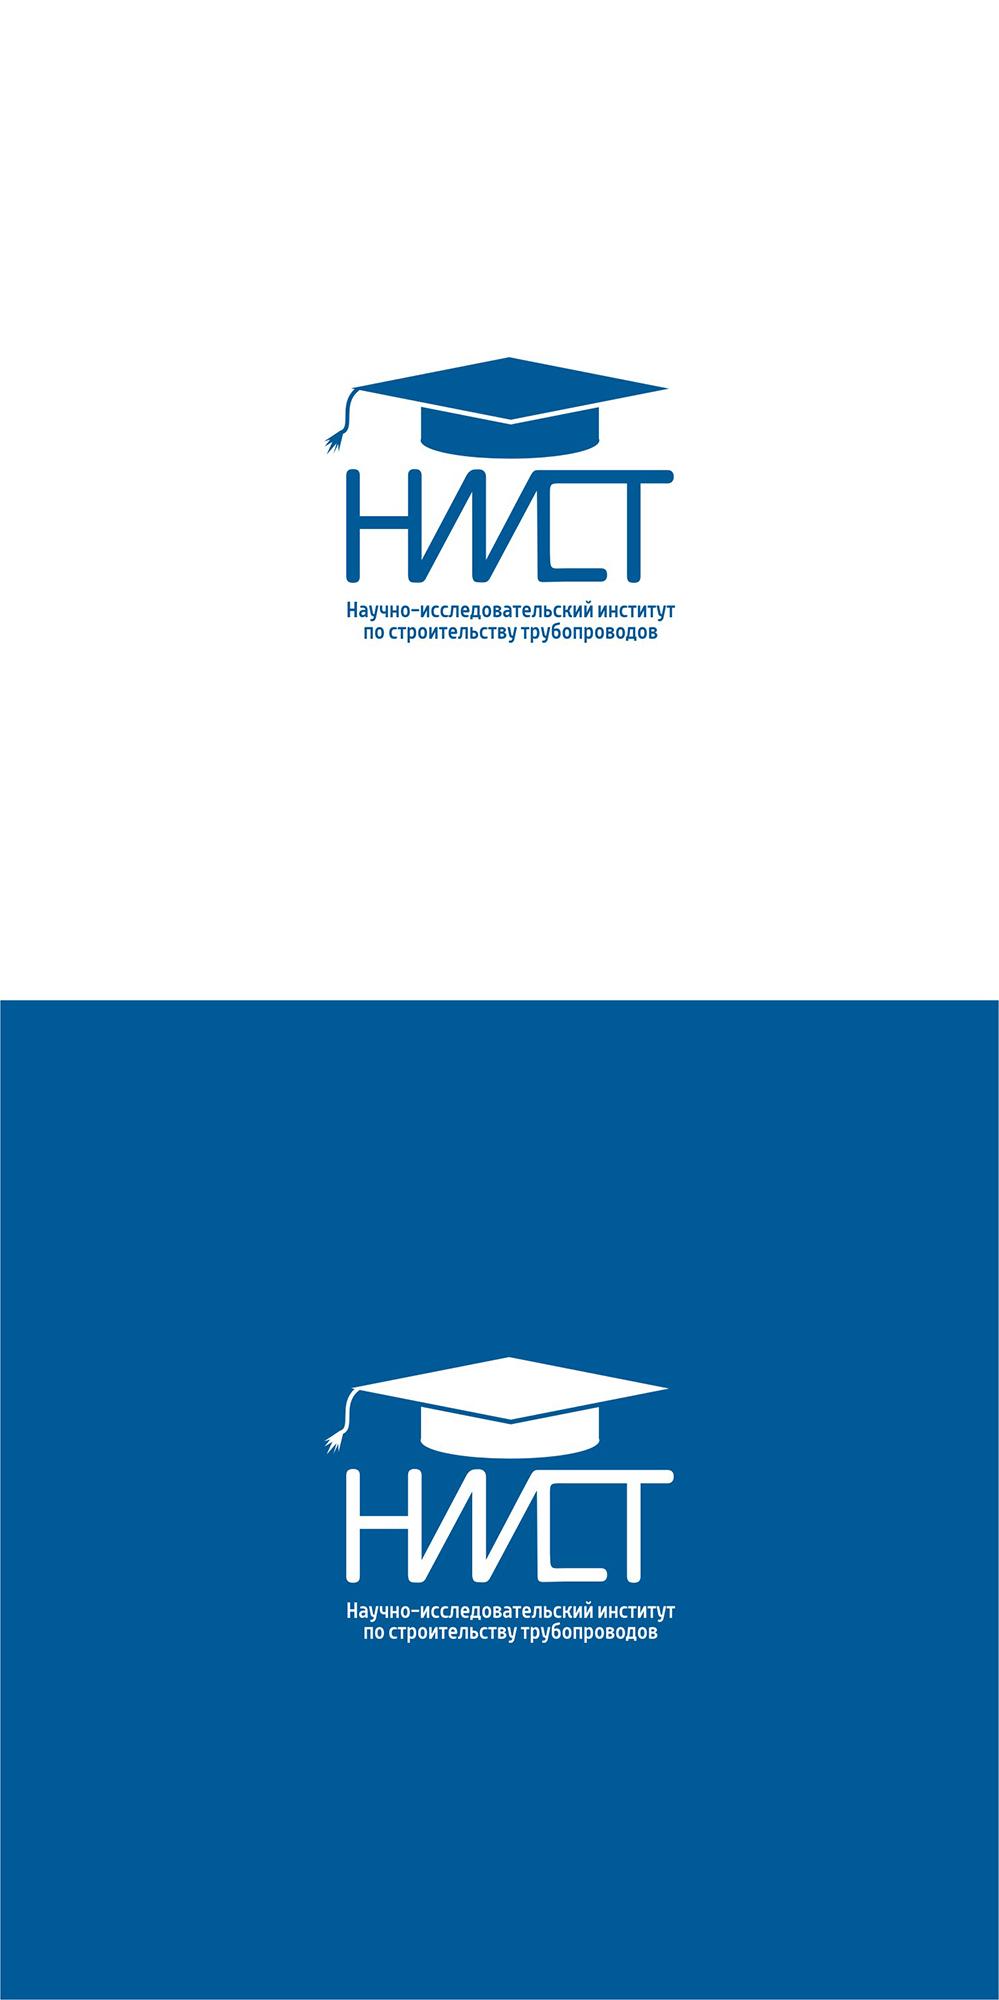 Разработка логотипа фото f_9355ba498614de76.jpg